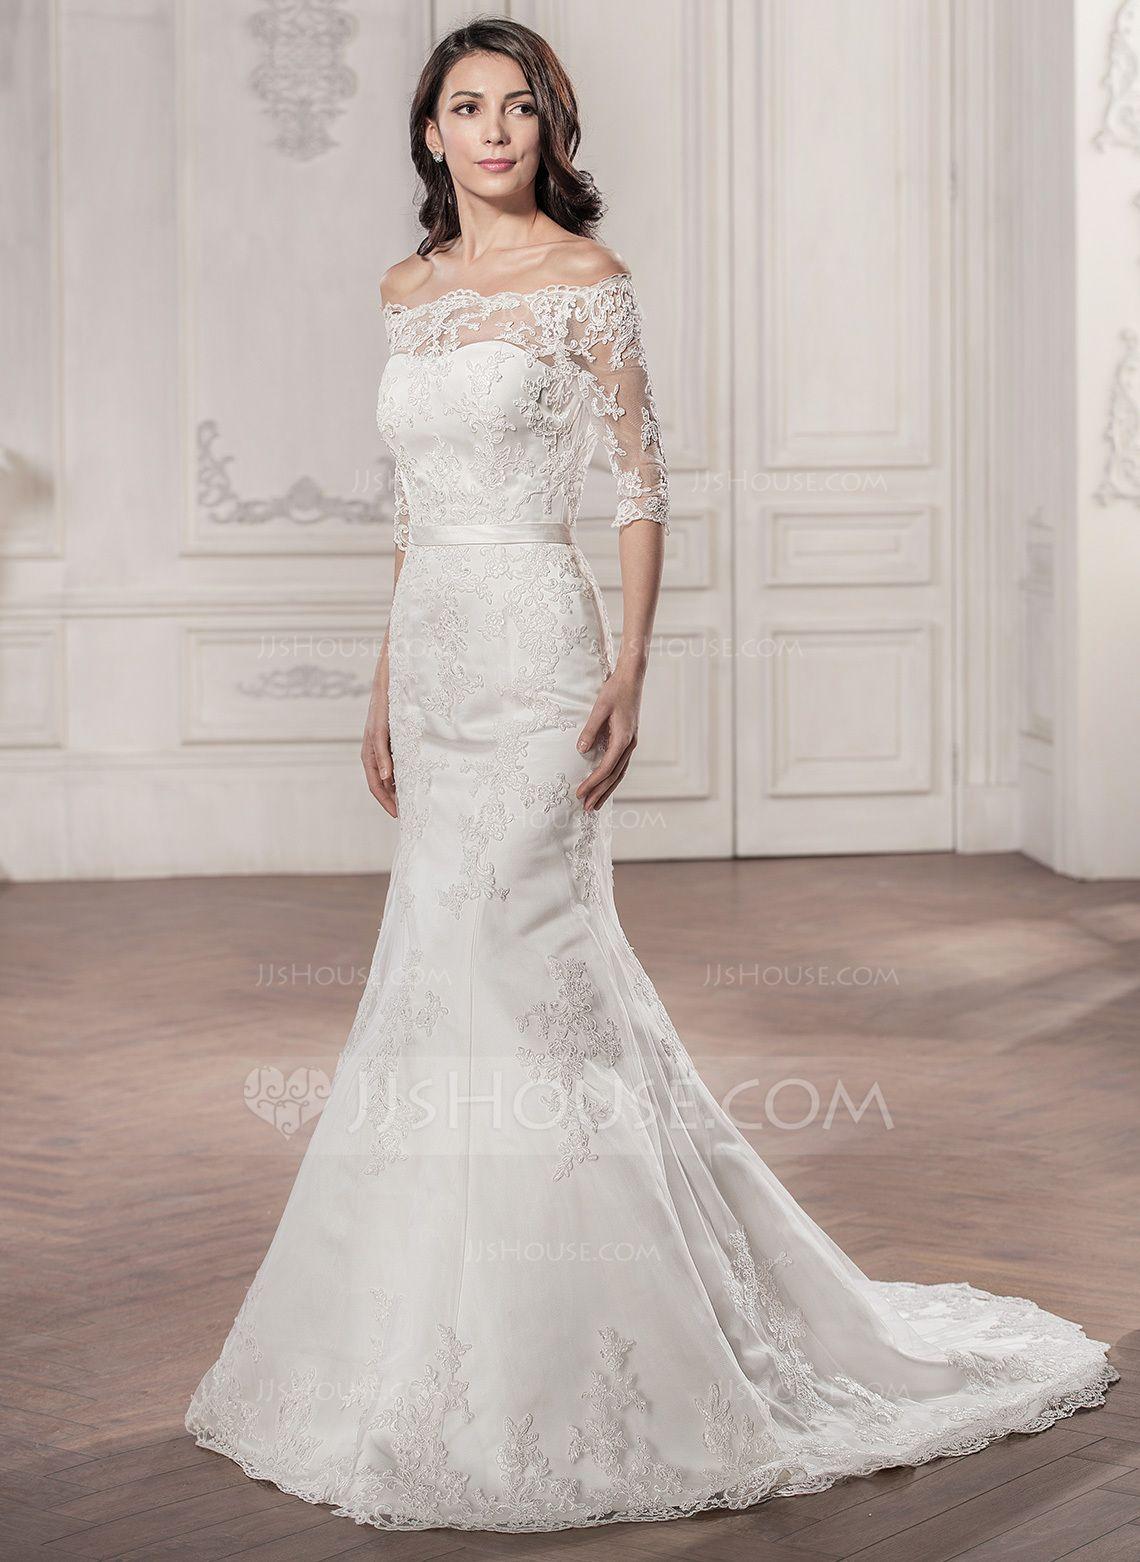 7cedecac Trumpet/Mermaid Off-the-Shoulder Court Train Satin Lace Wedding Dress  (002058786) - JJsHouse